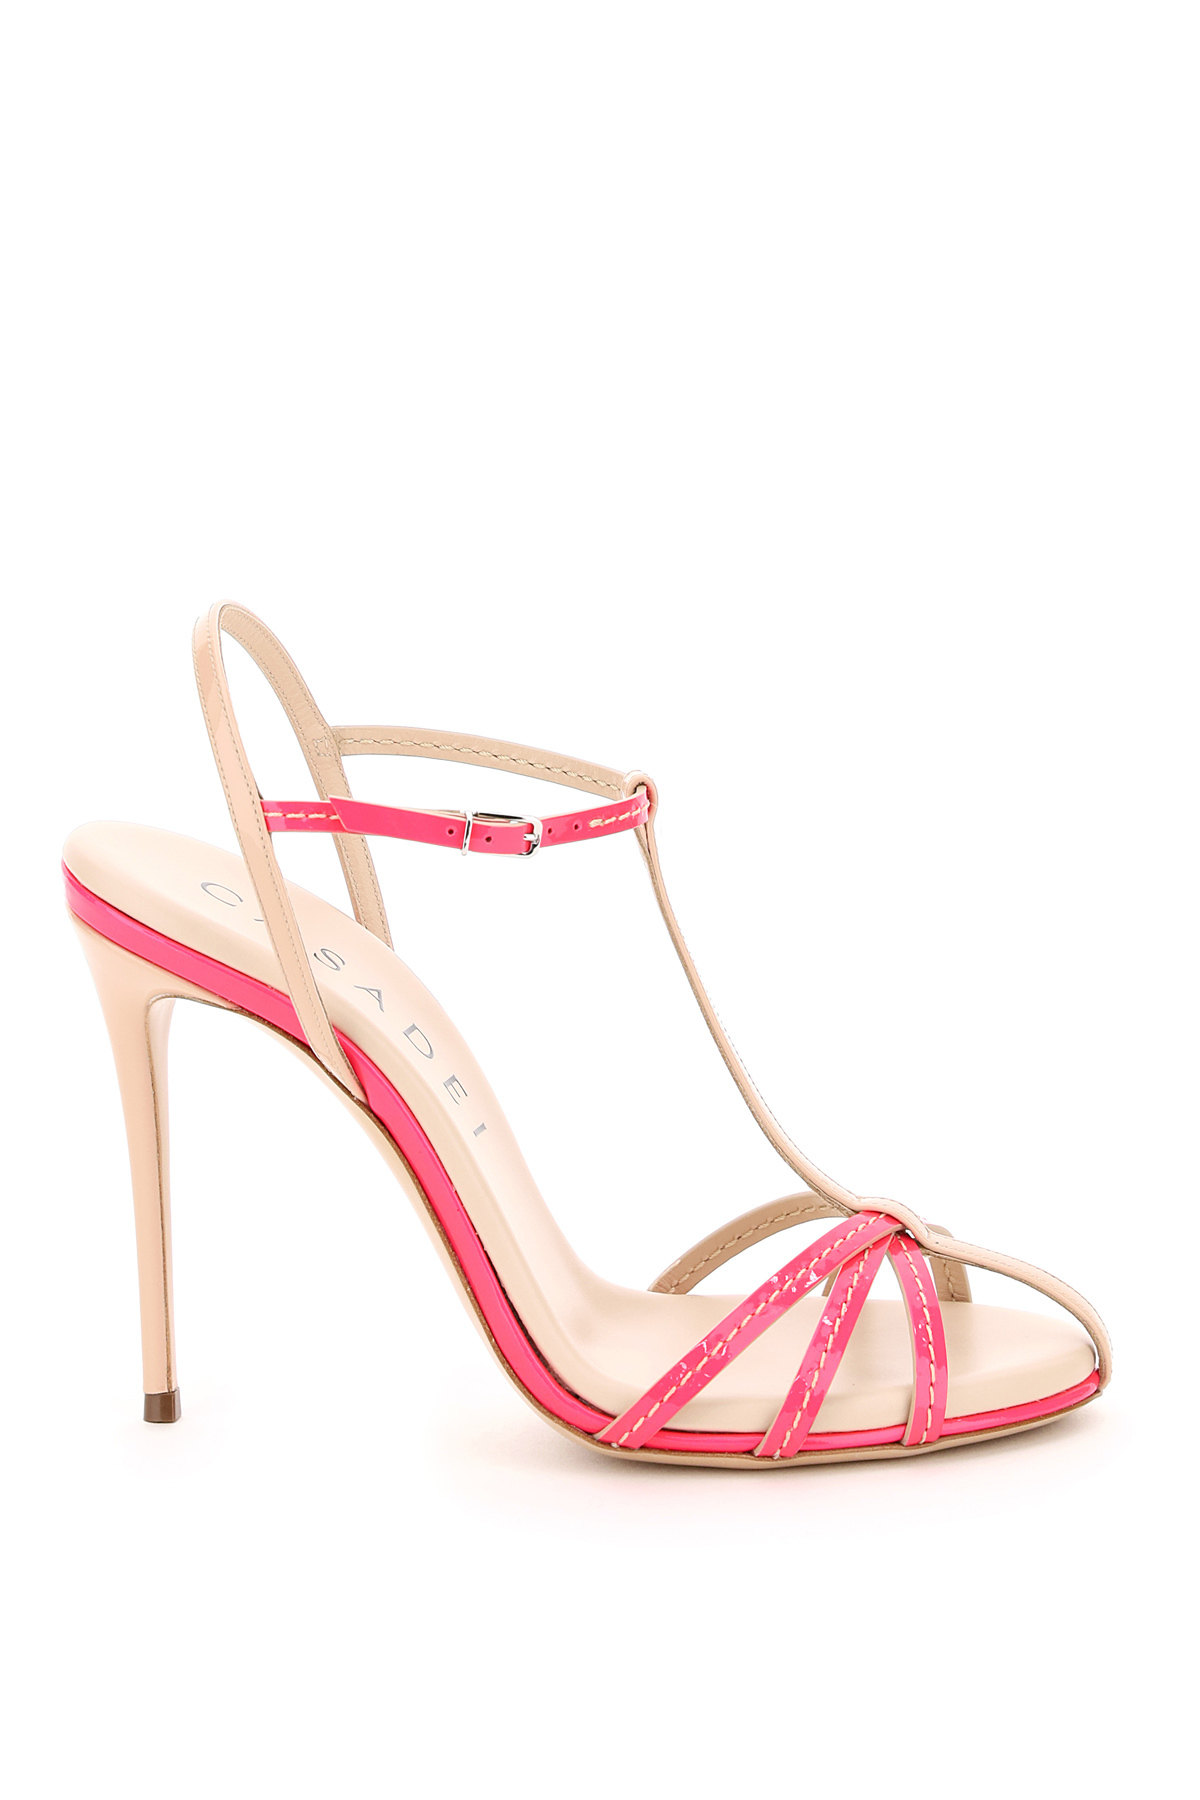 Casadei sandali jeannie tiffany